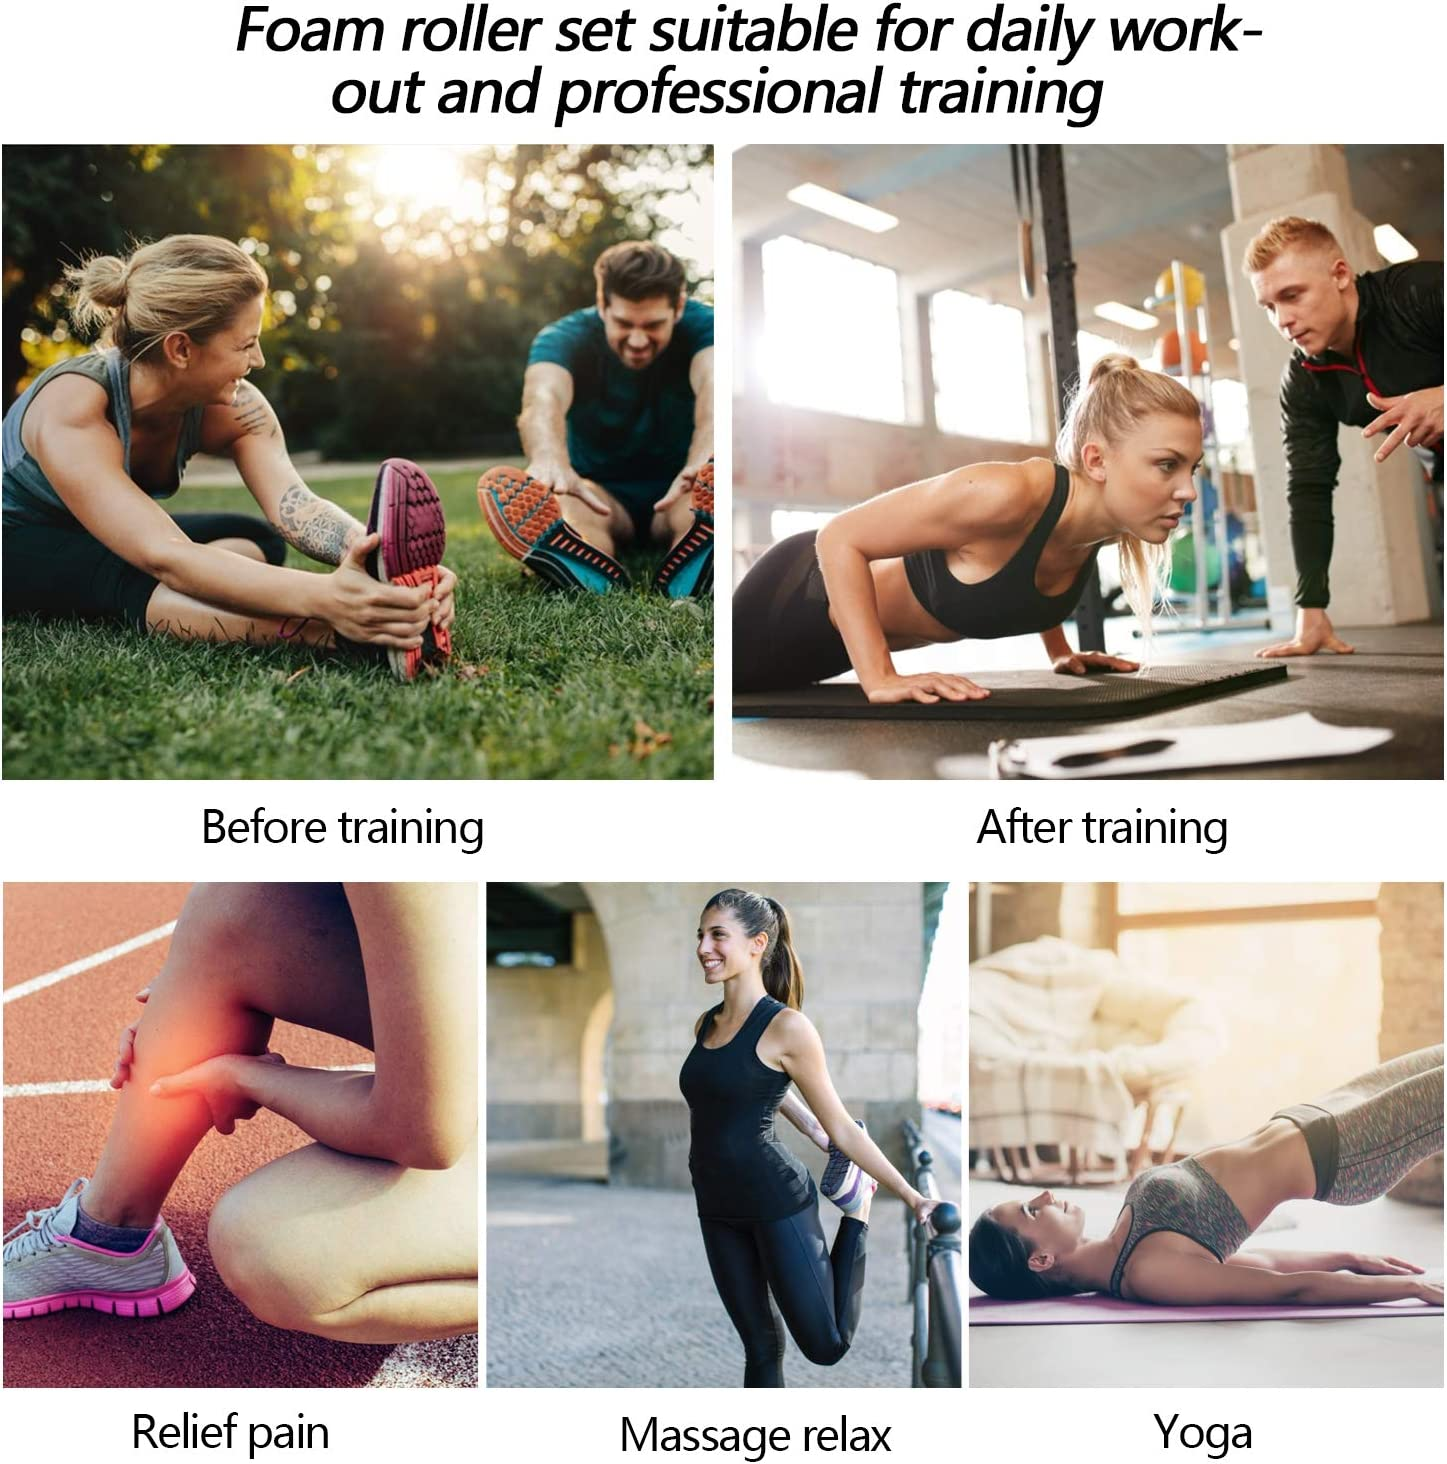 HBselect Foam Roller Rodillo Masaje Muscular Bola Masaje Rulo Masaje Rollo Masaje para Relajar Muscular Pies y Espalda Pierna Fitness